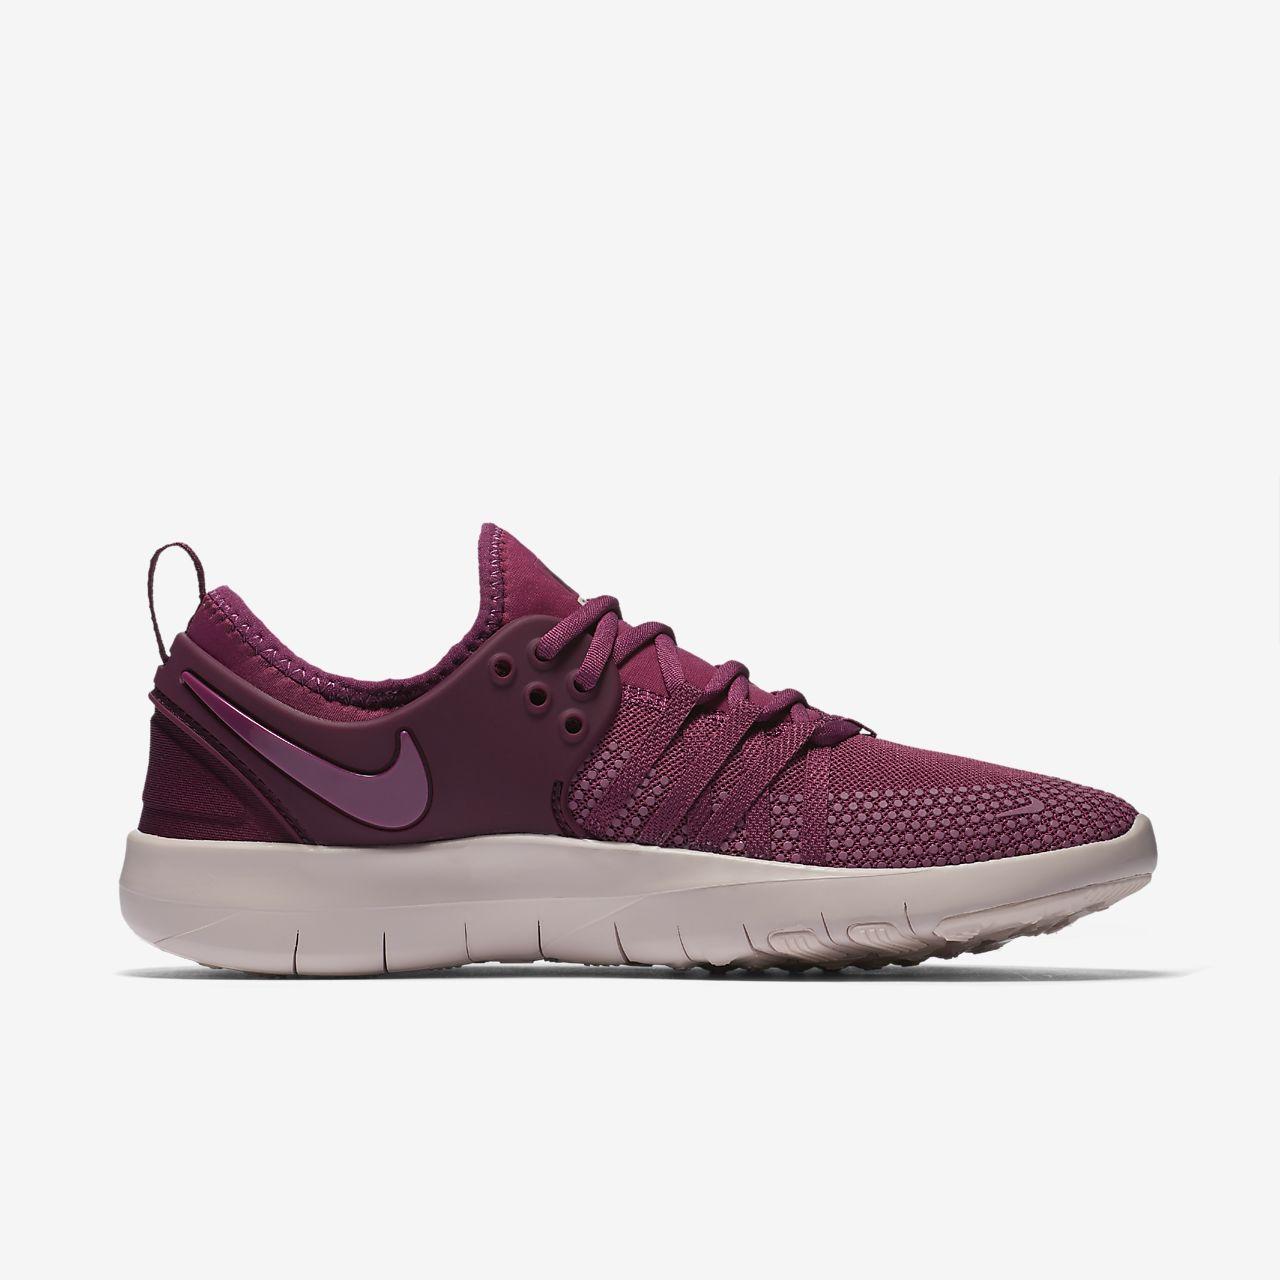 low priced 9199e c3be3 ... Nike Free TR 7 Womens Training Shoe